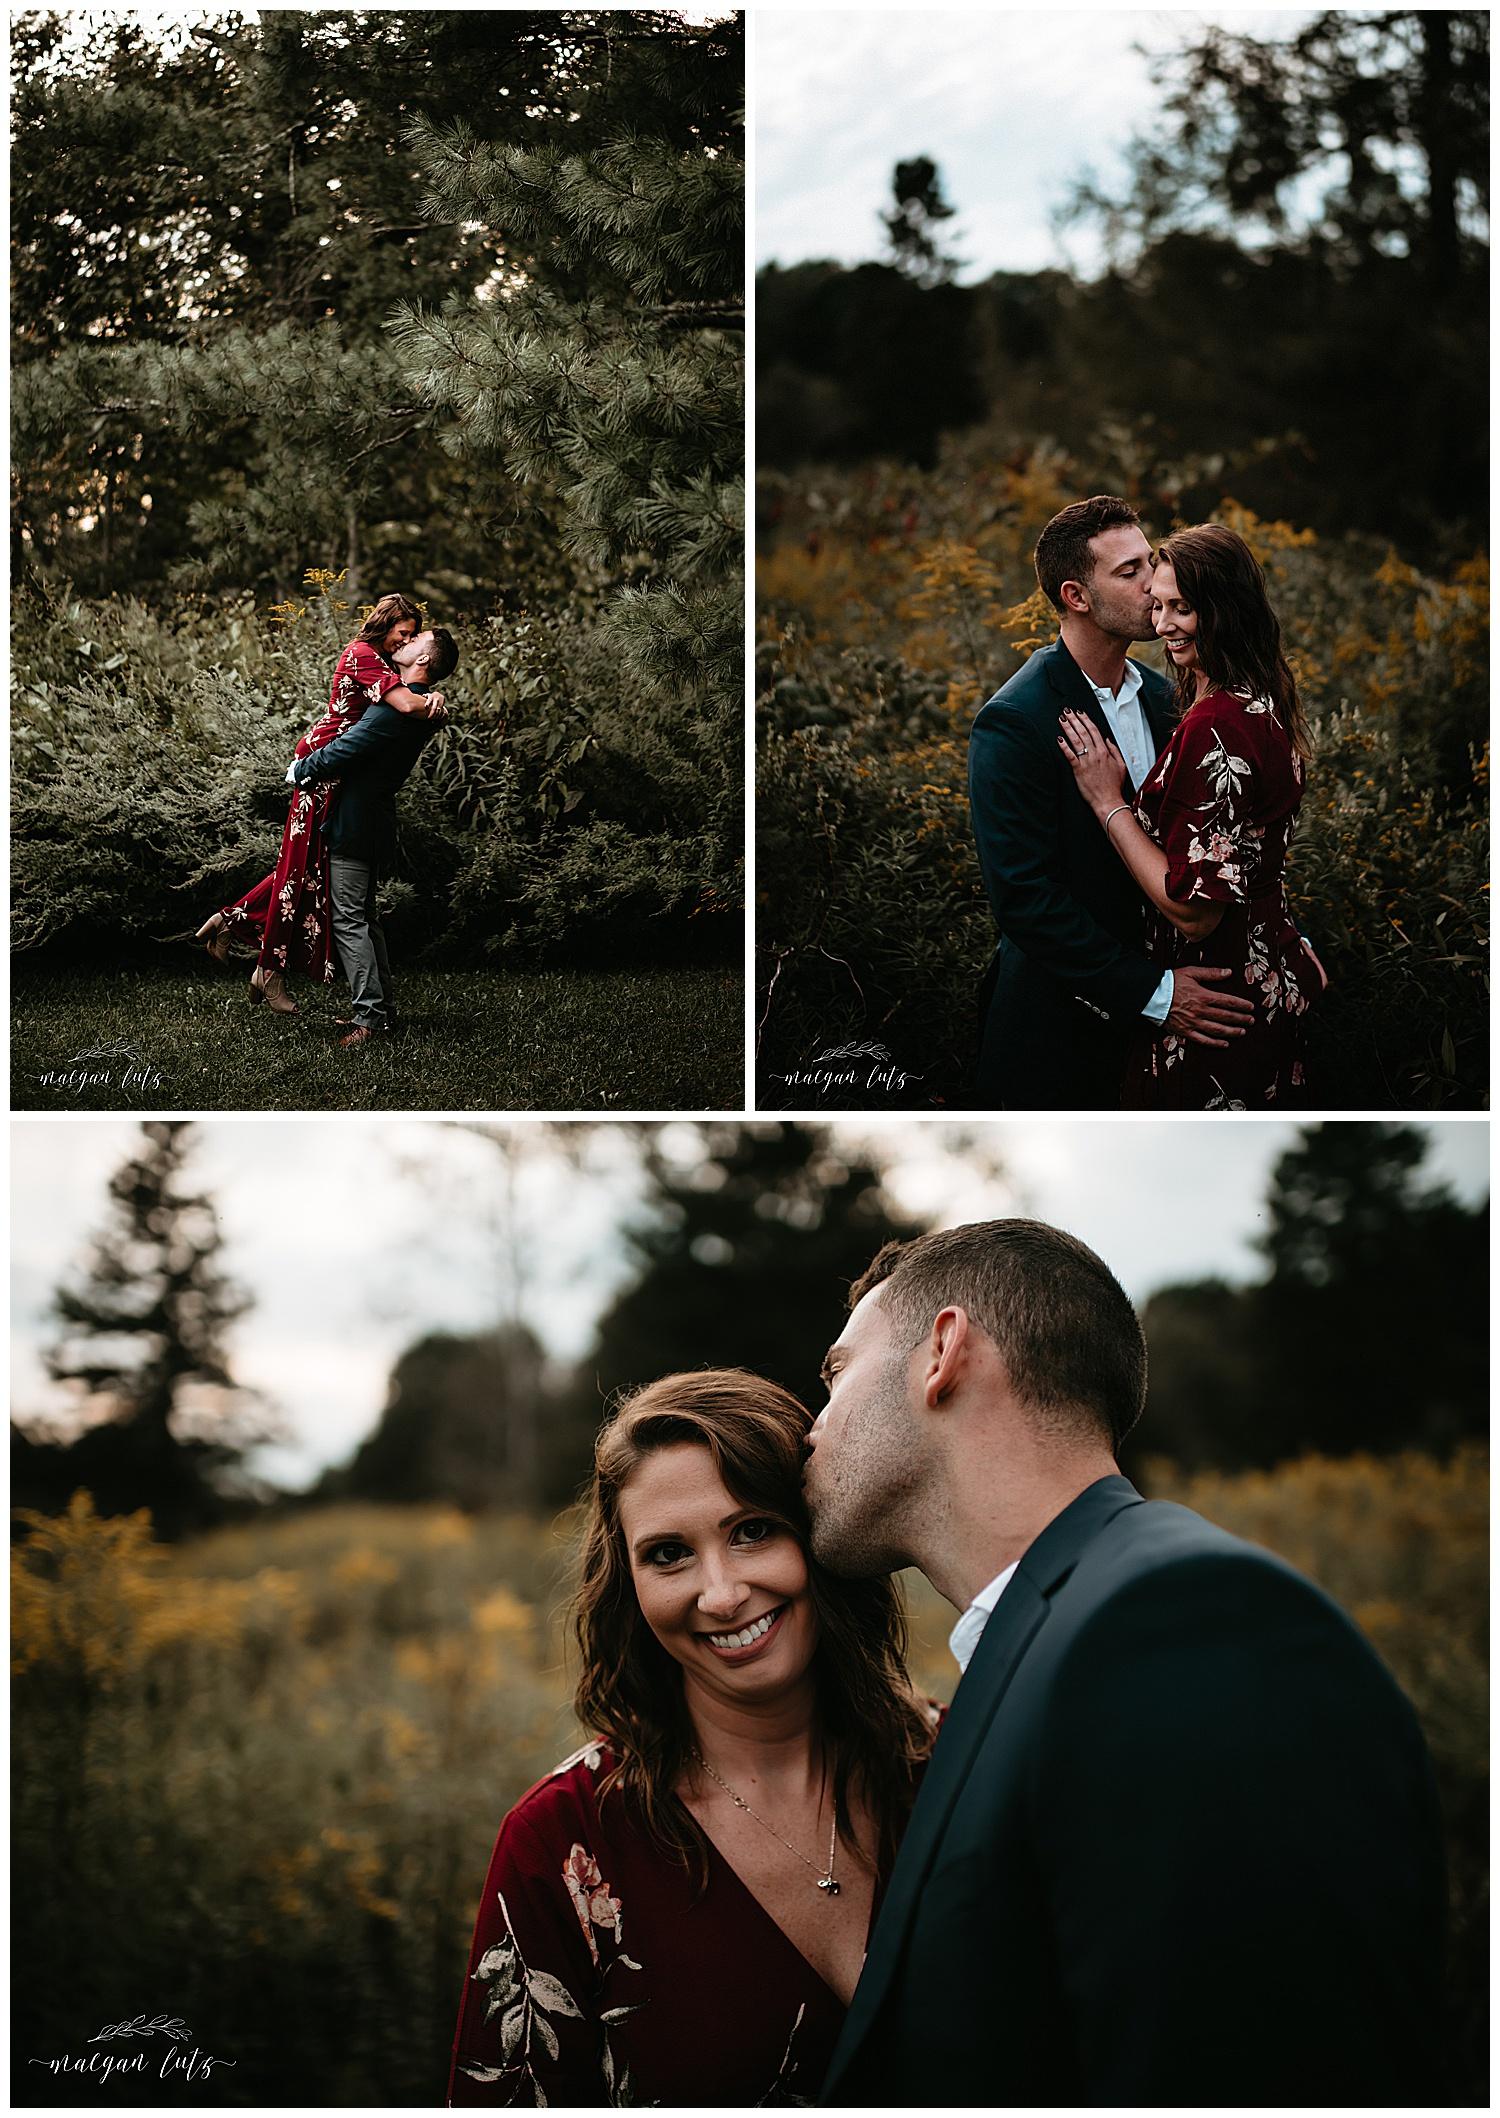 NEPA-Bloomgsburg-Wedding-Photographer-in-the-Lehigh-Valley_0013.jpg